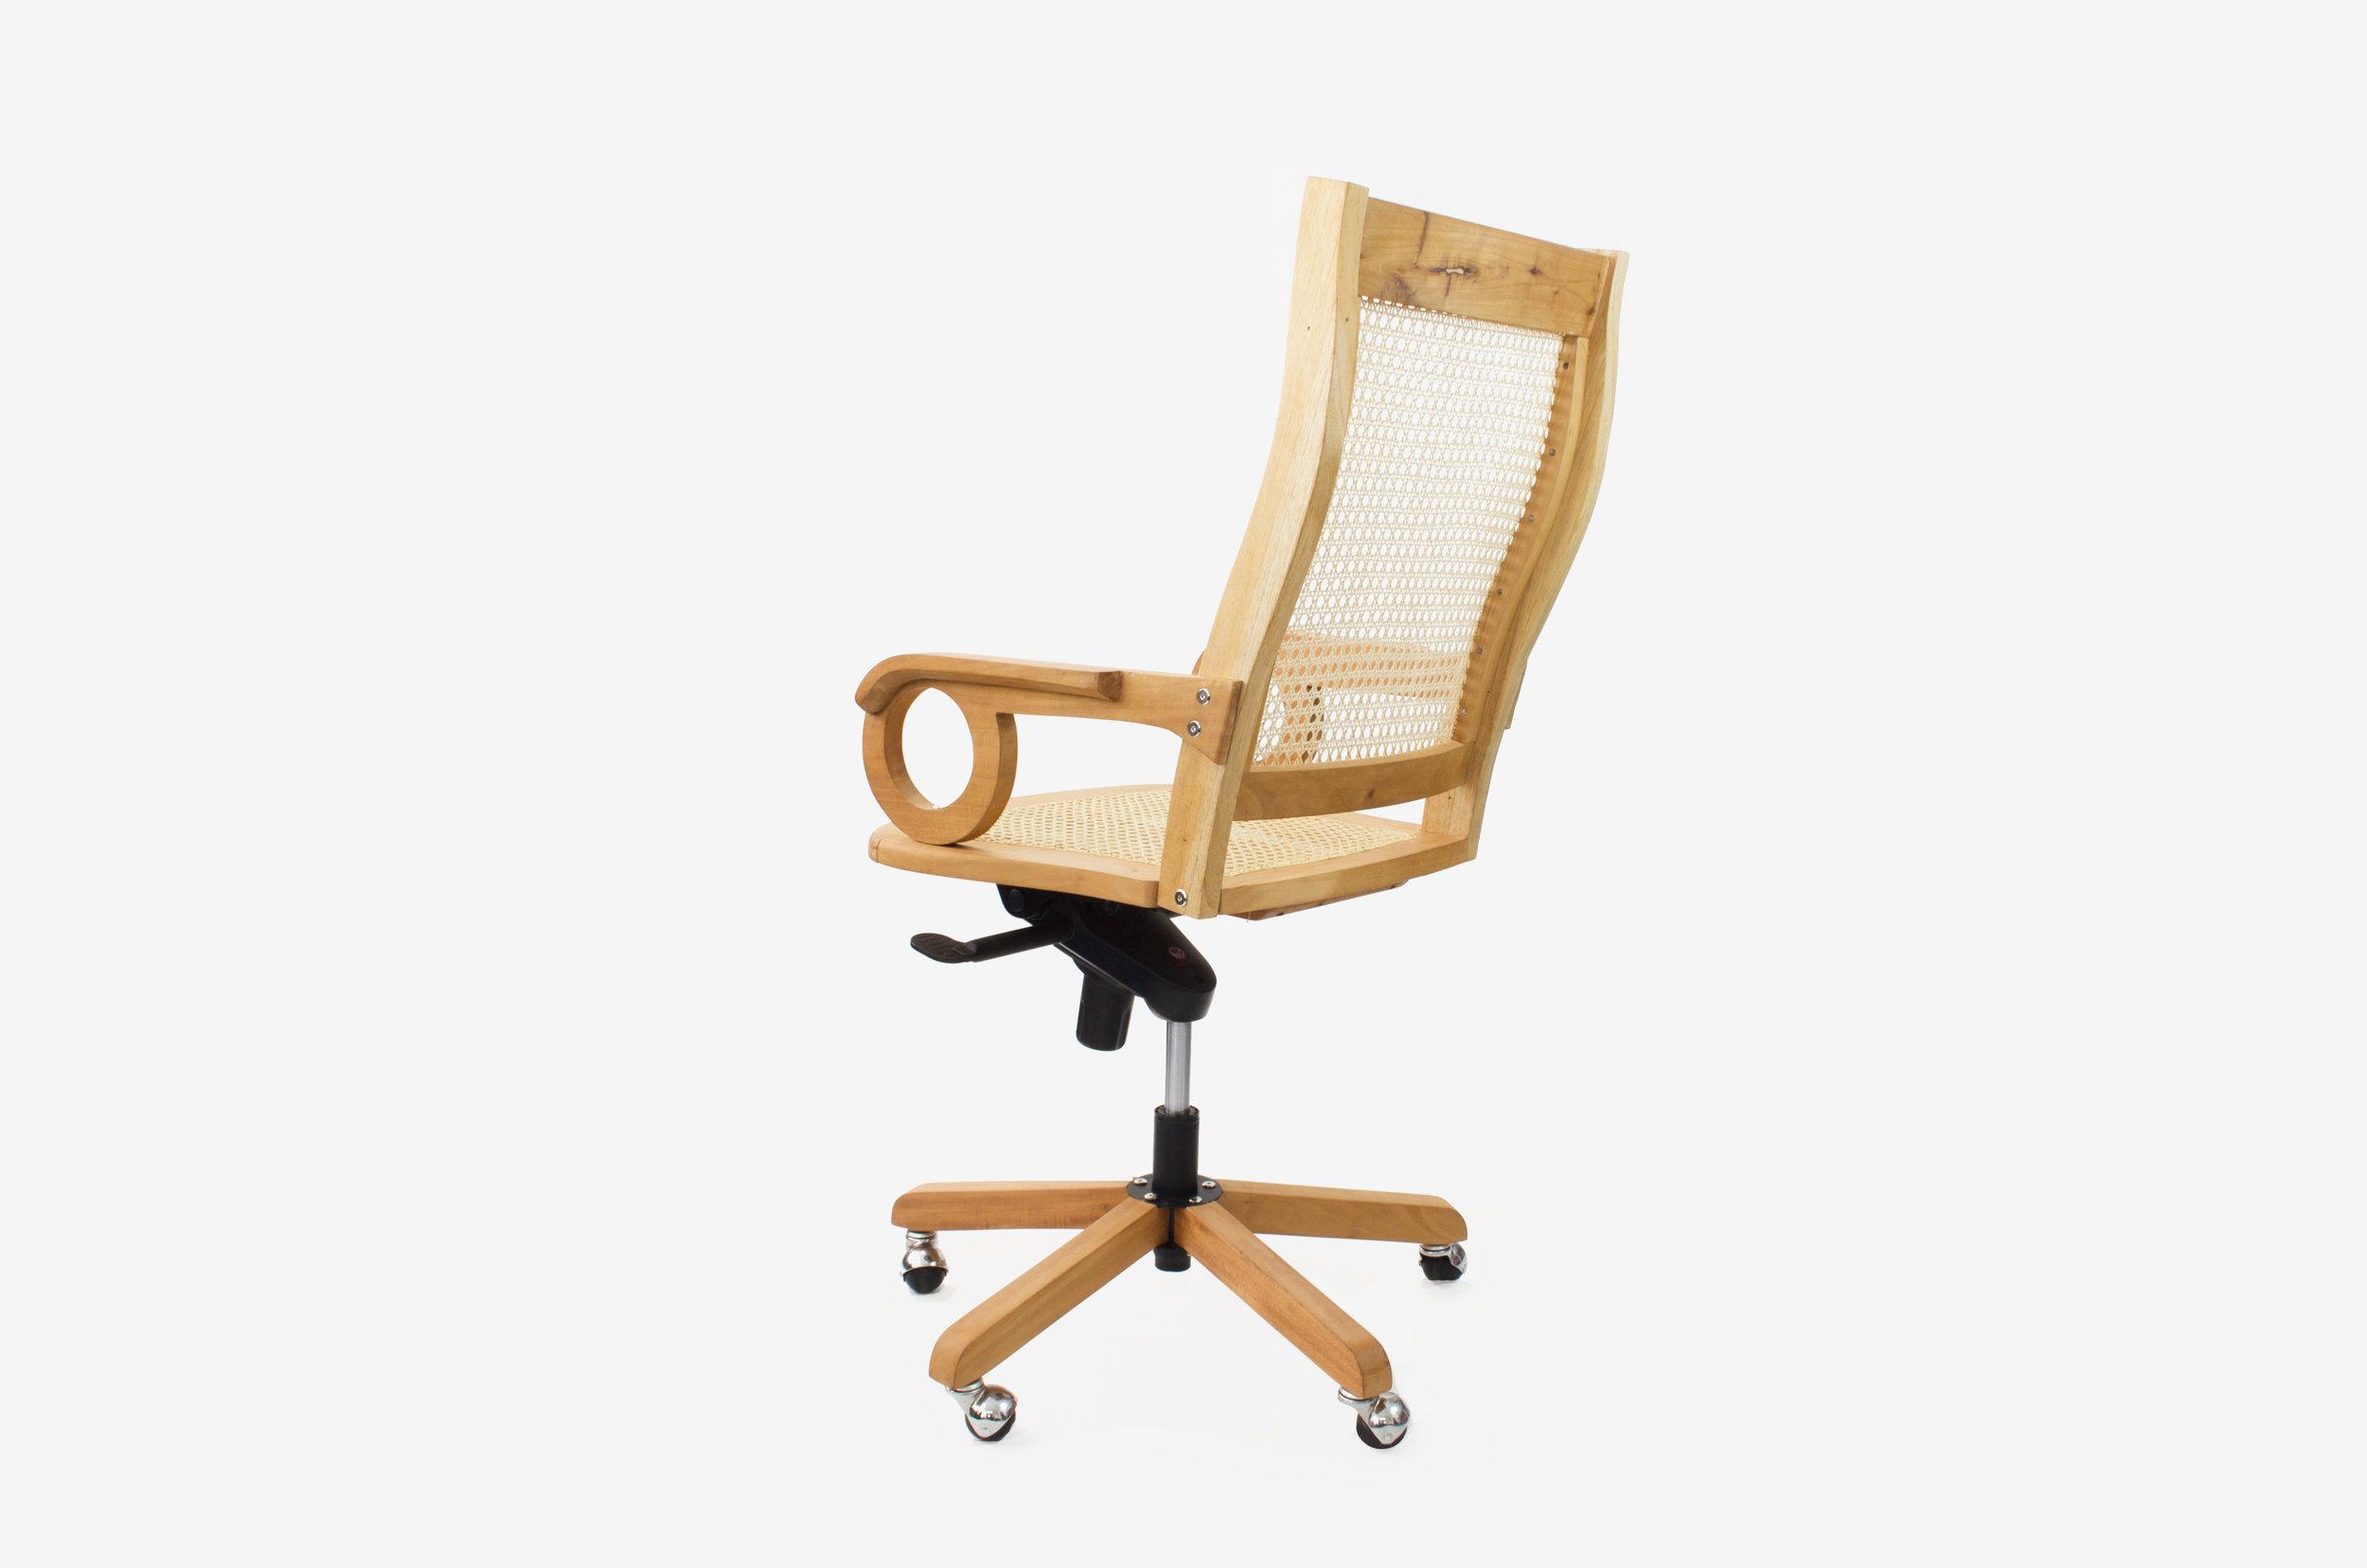 00_Standar Office Chair_04.jpg